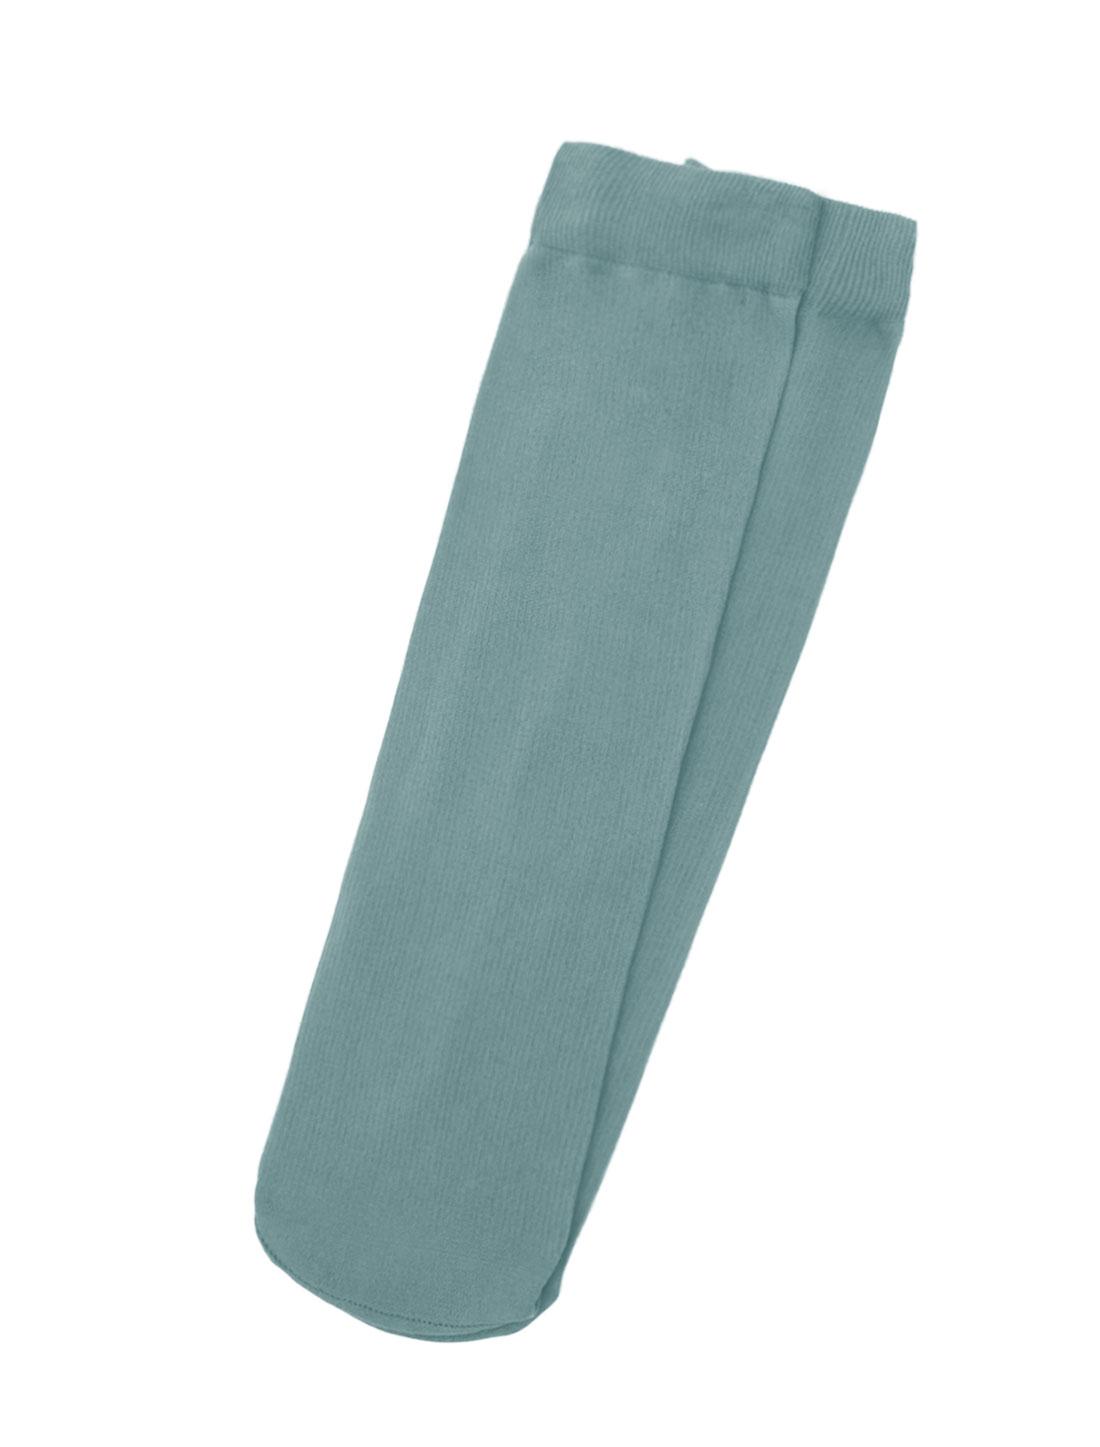 Men Elastic Cuffs Ribbed Stretchy Sheer Crew Socks 10 Pairs Gray